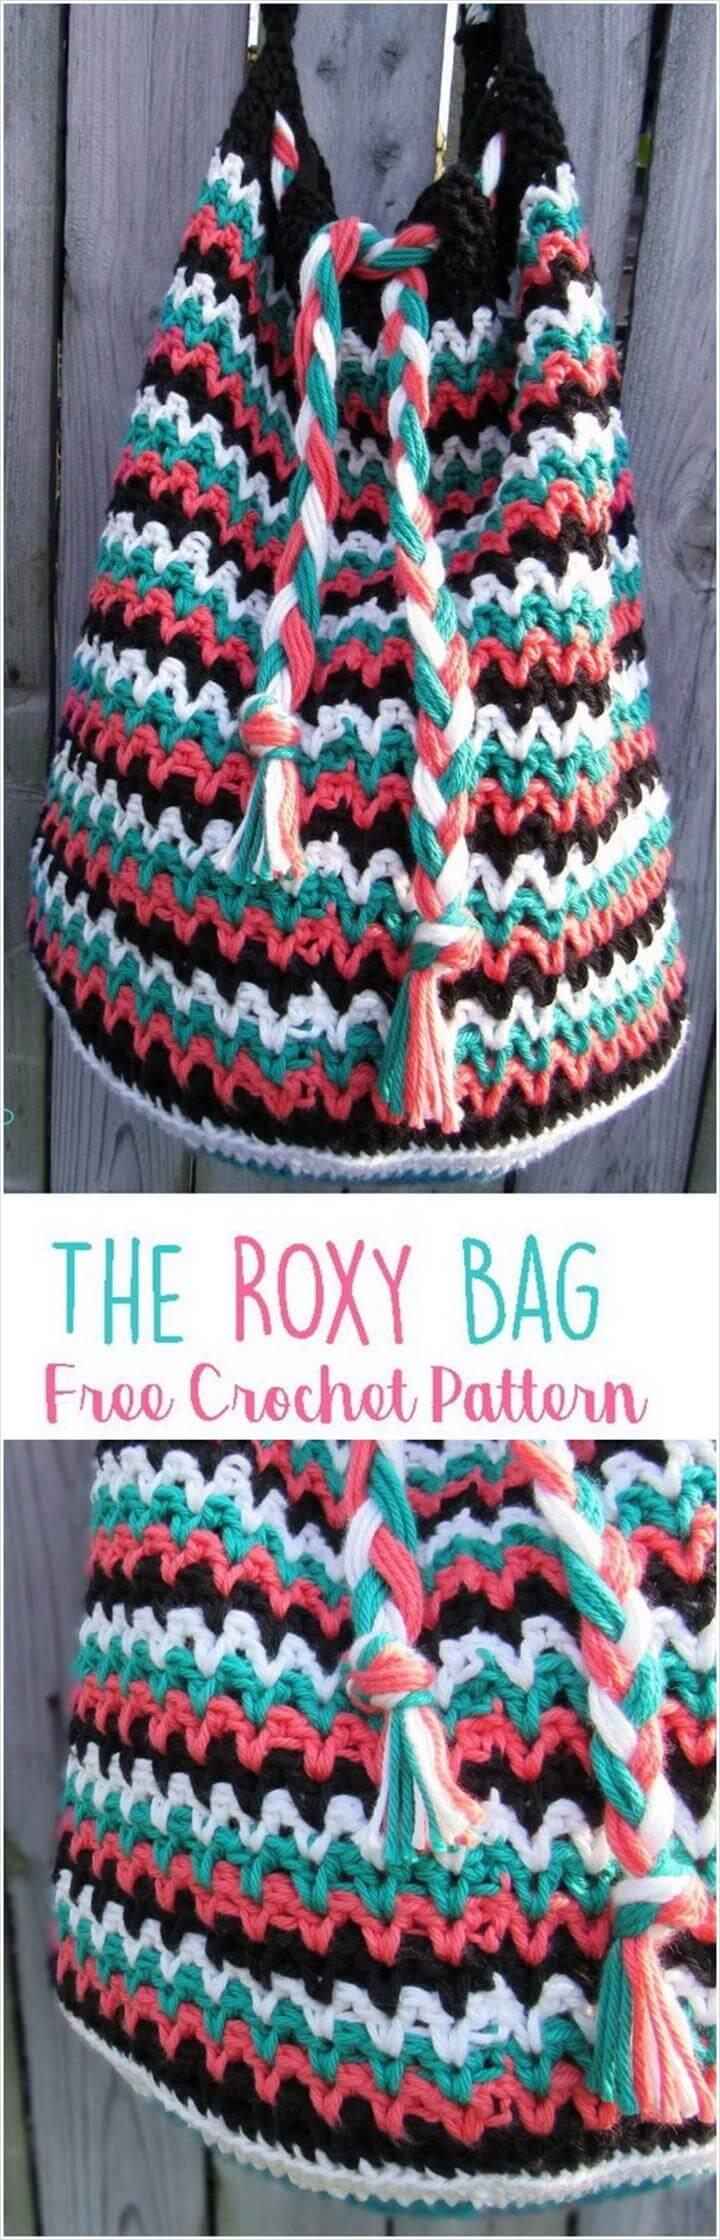 Crochet Roxy Bag